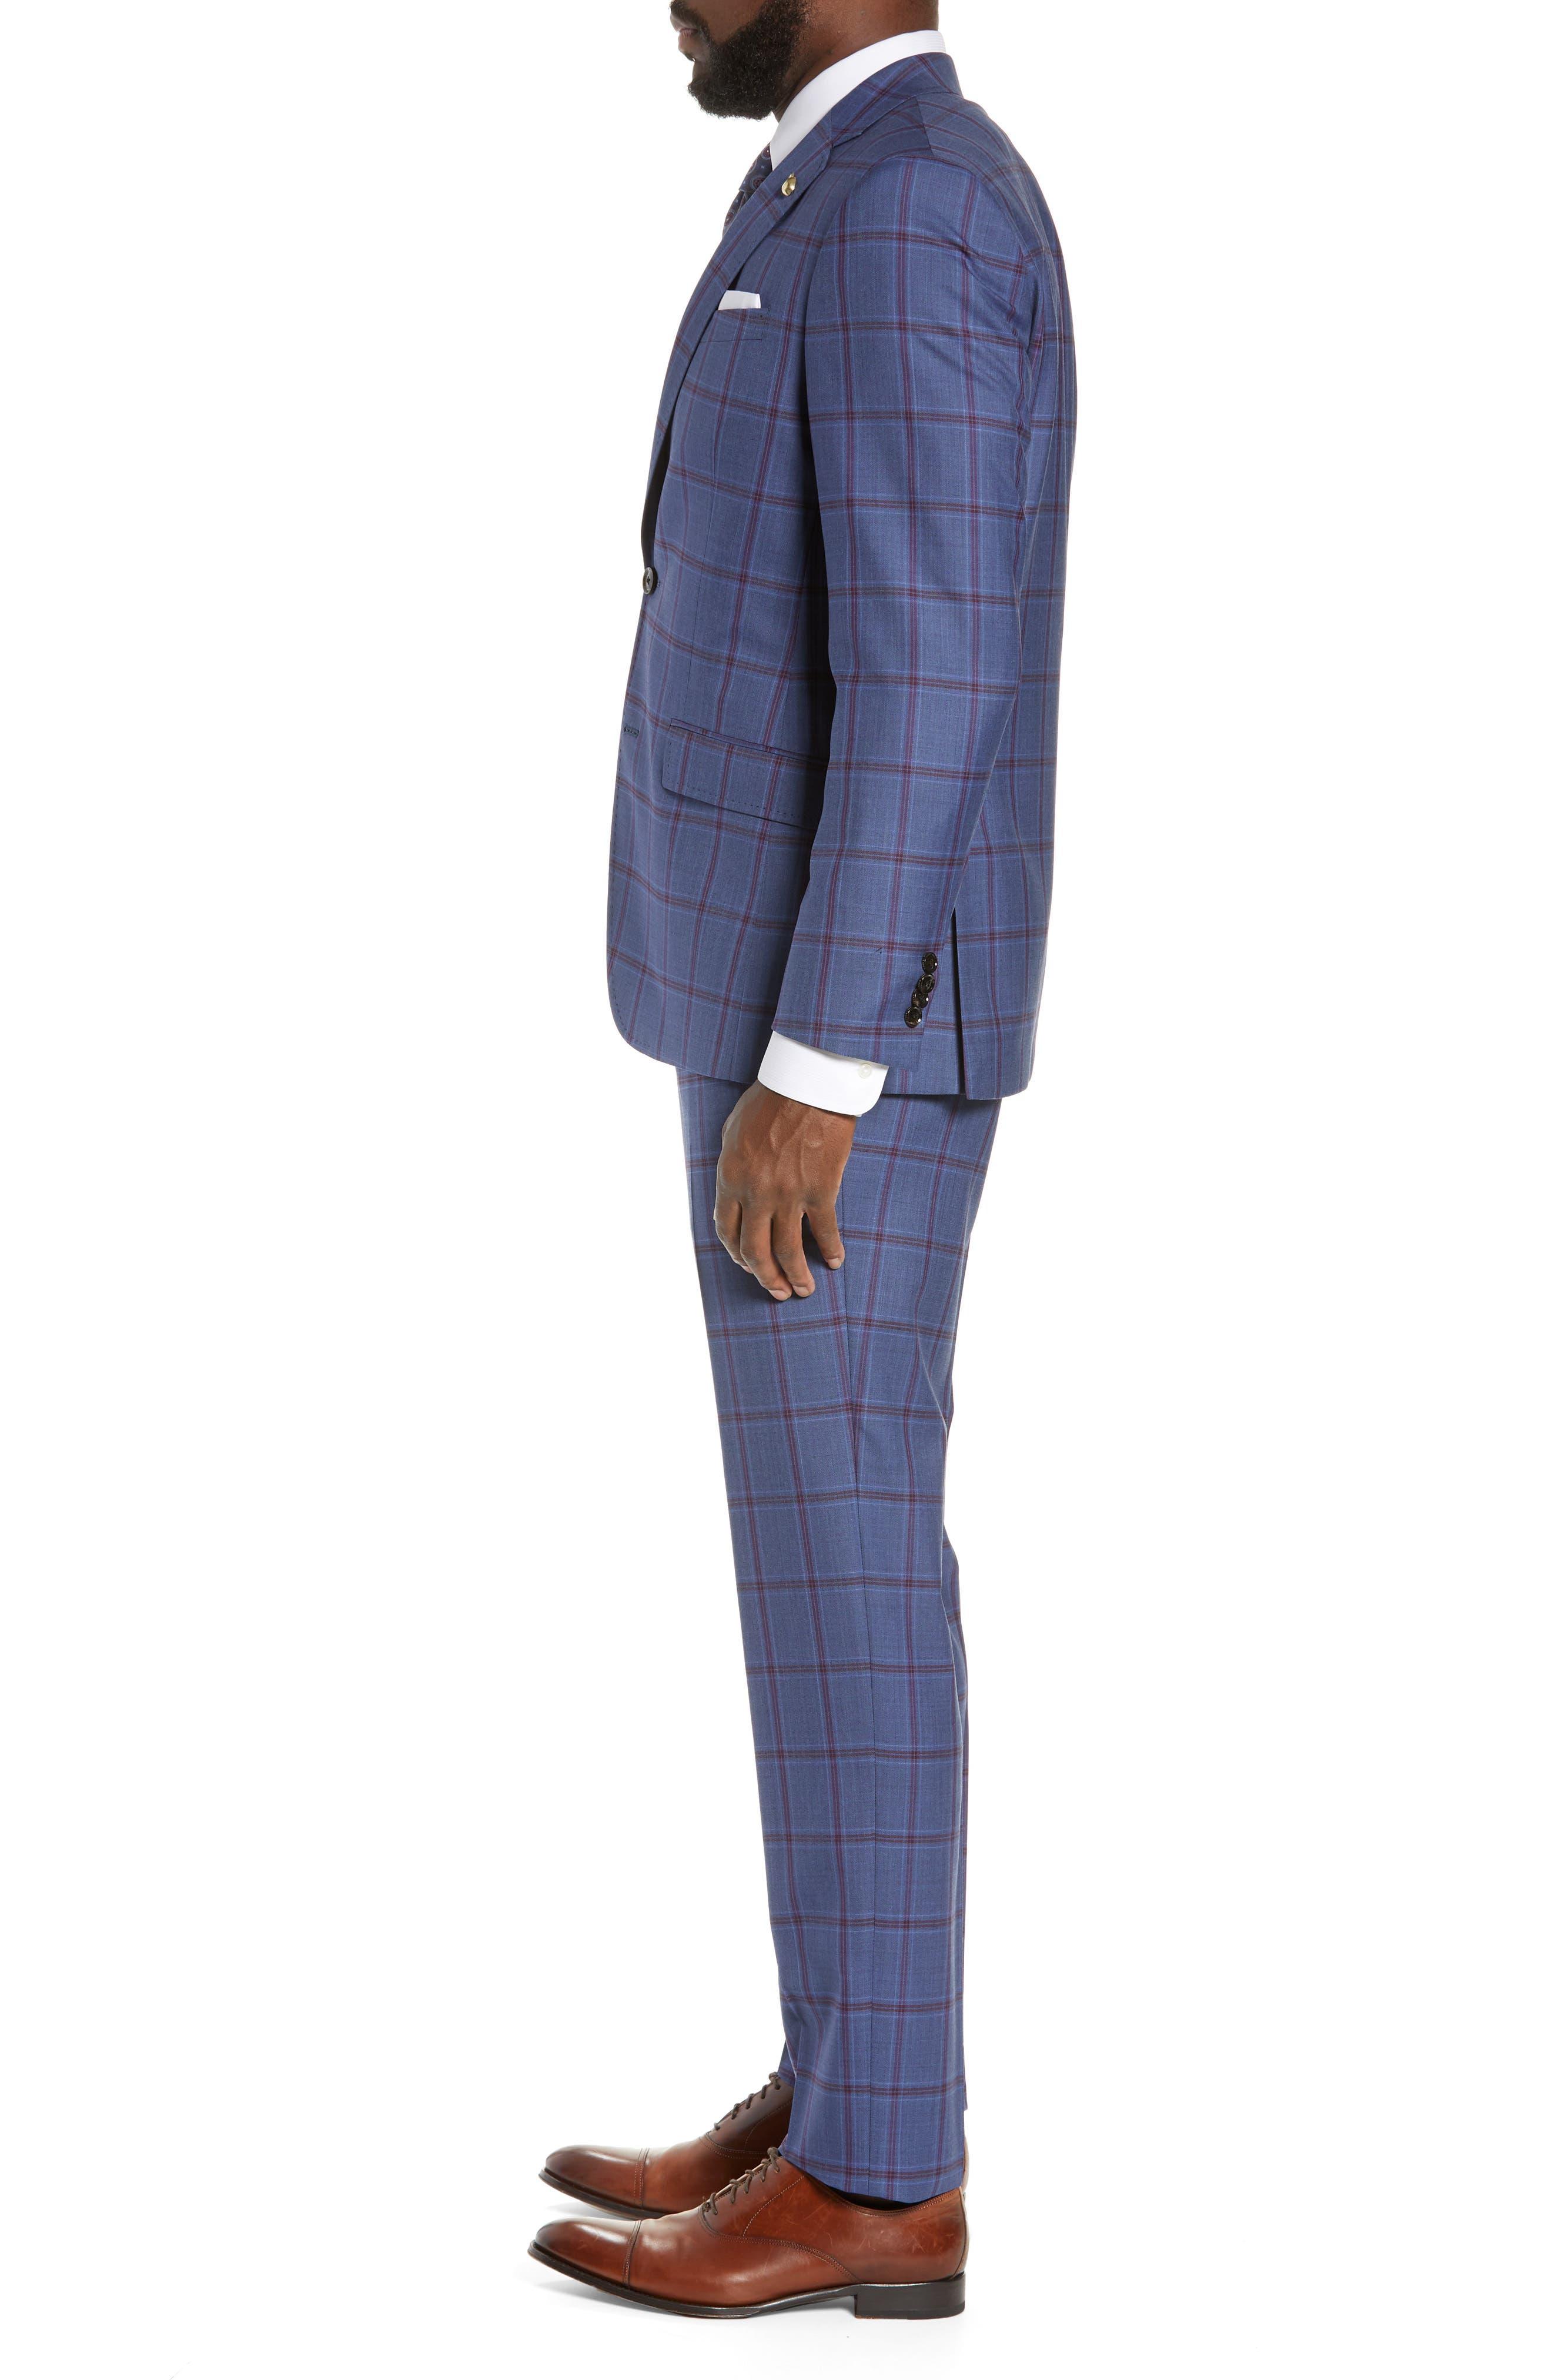 TED BAKER LONDON, Jay Trim Fit Windowpane Suit, Alternate thumbnail 3, color, BLUE